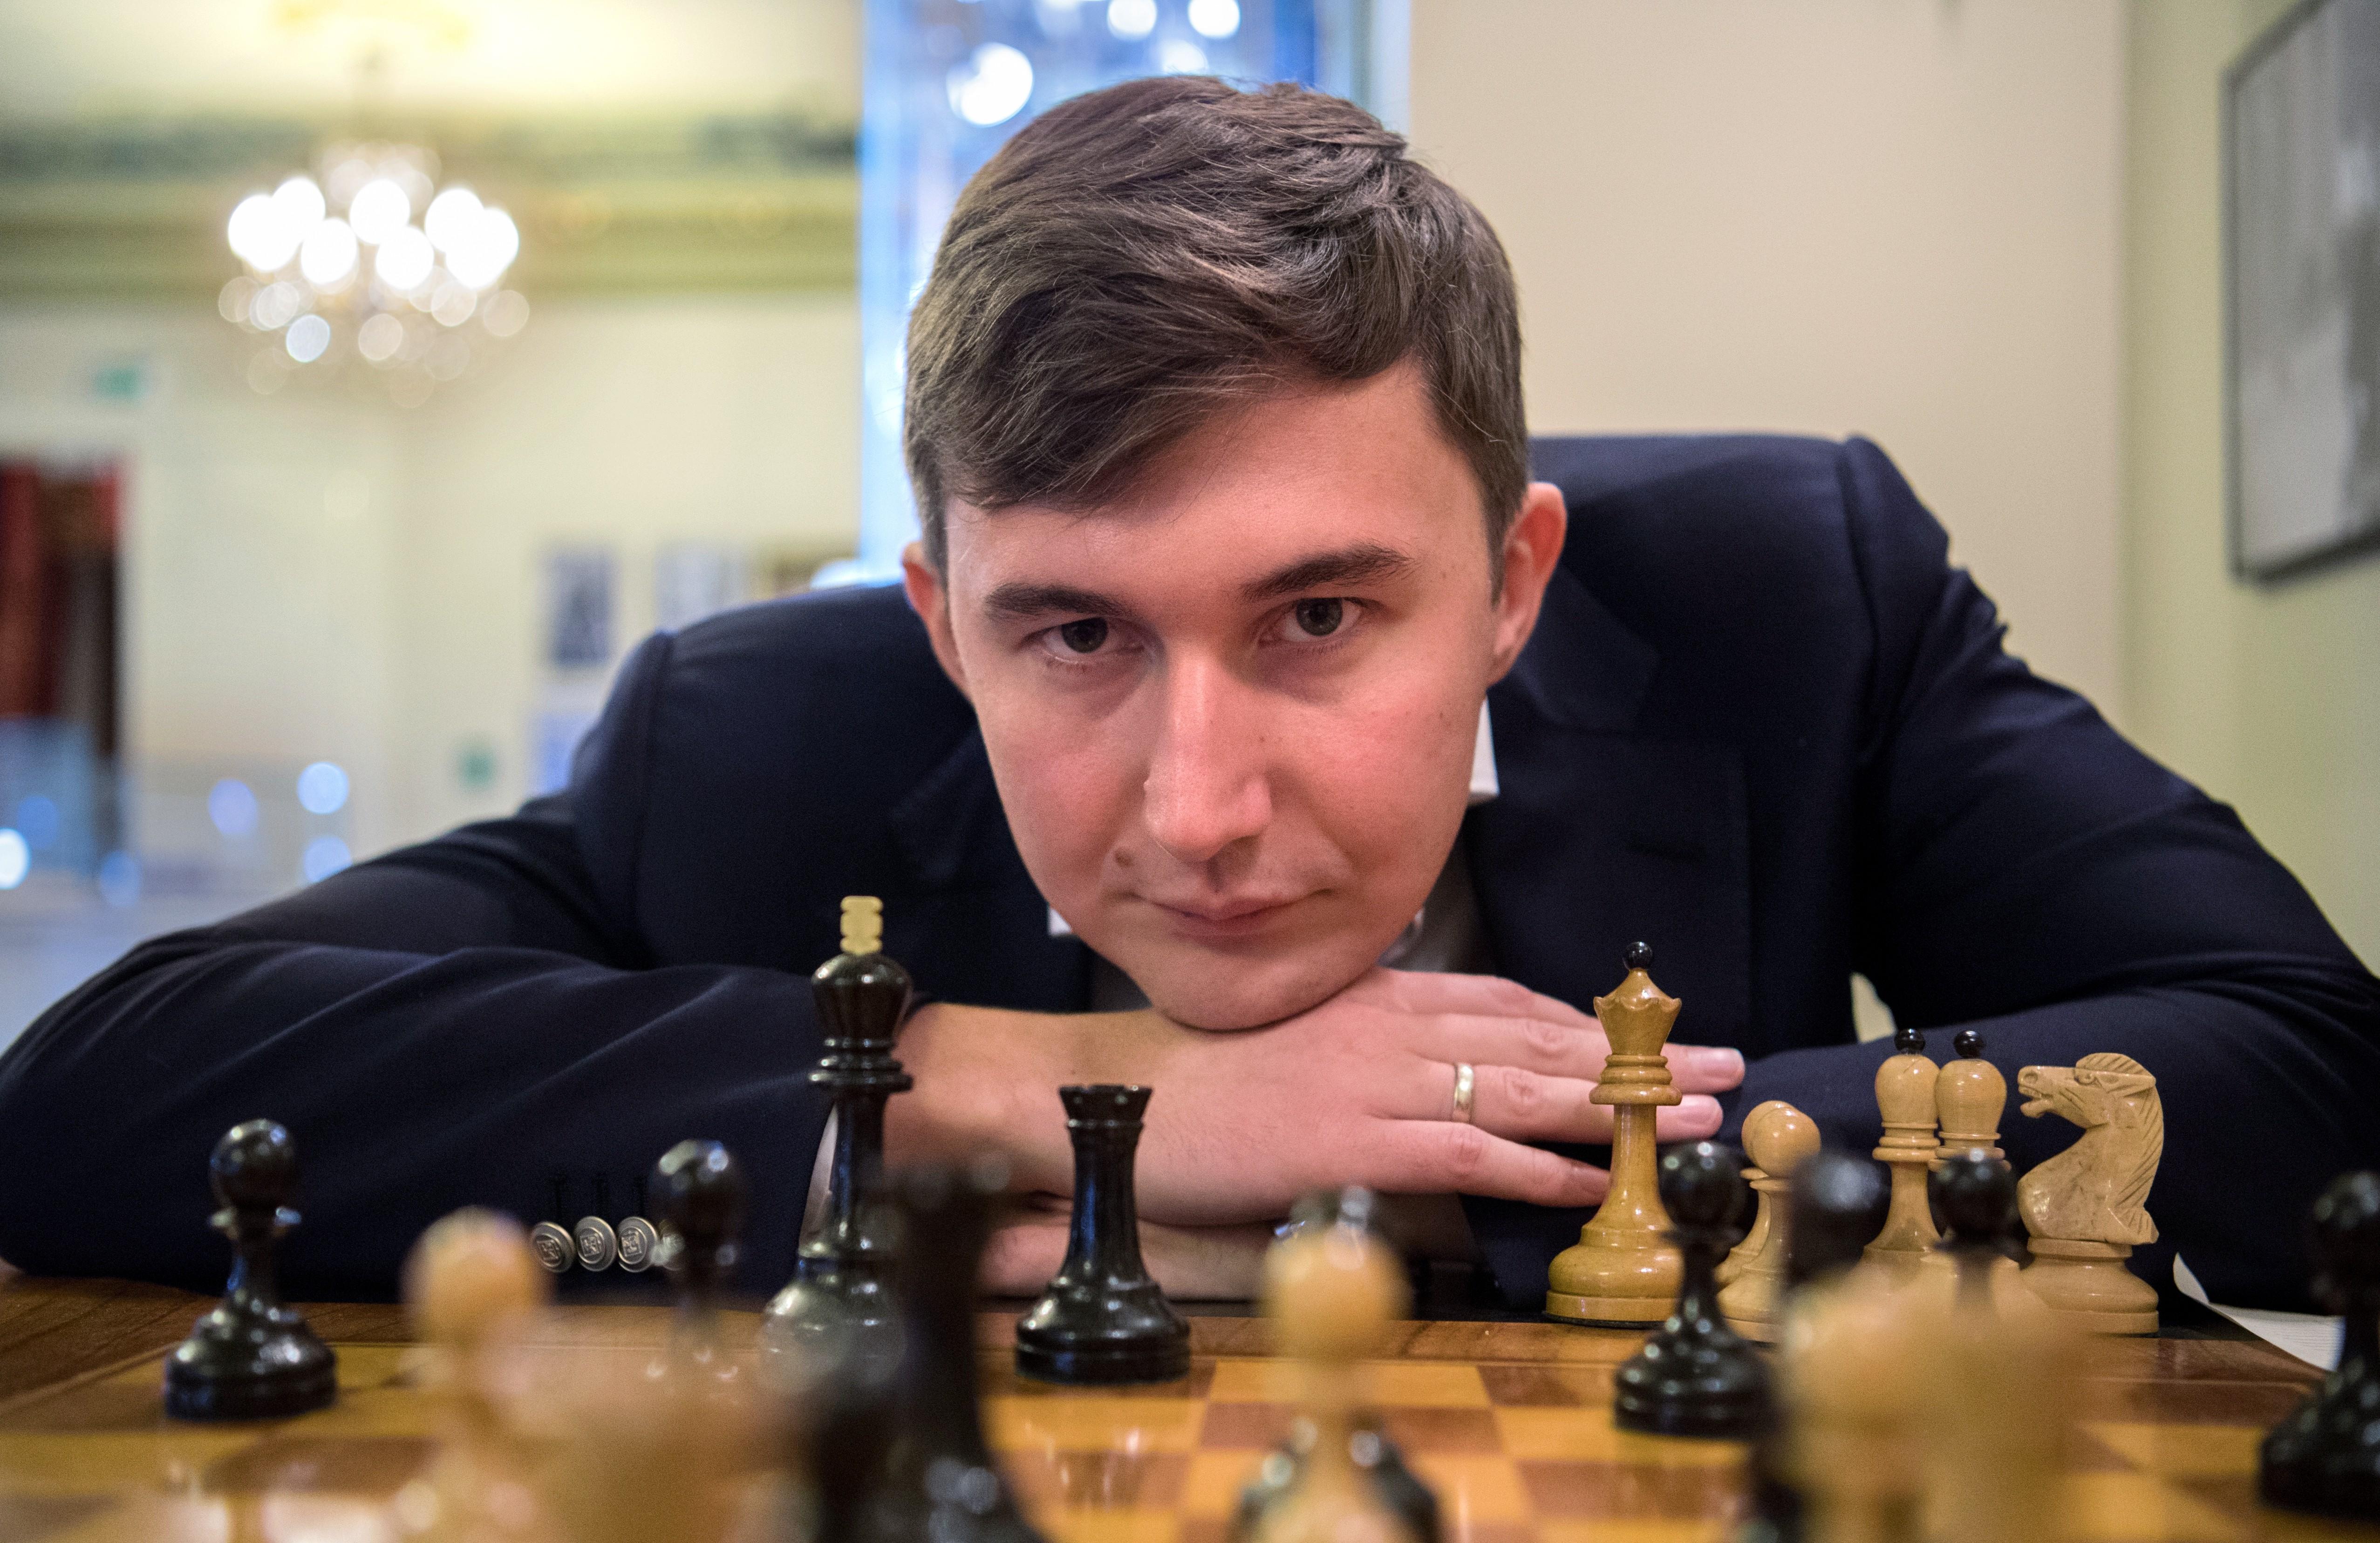 <p><span>Фото: &copy; РИА Новости/Сергей Гунеев</span></p>